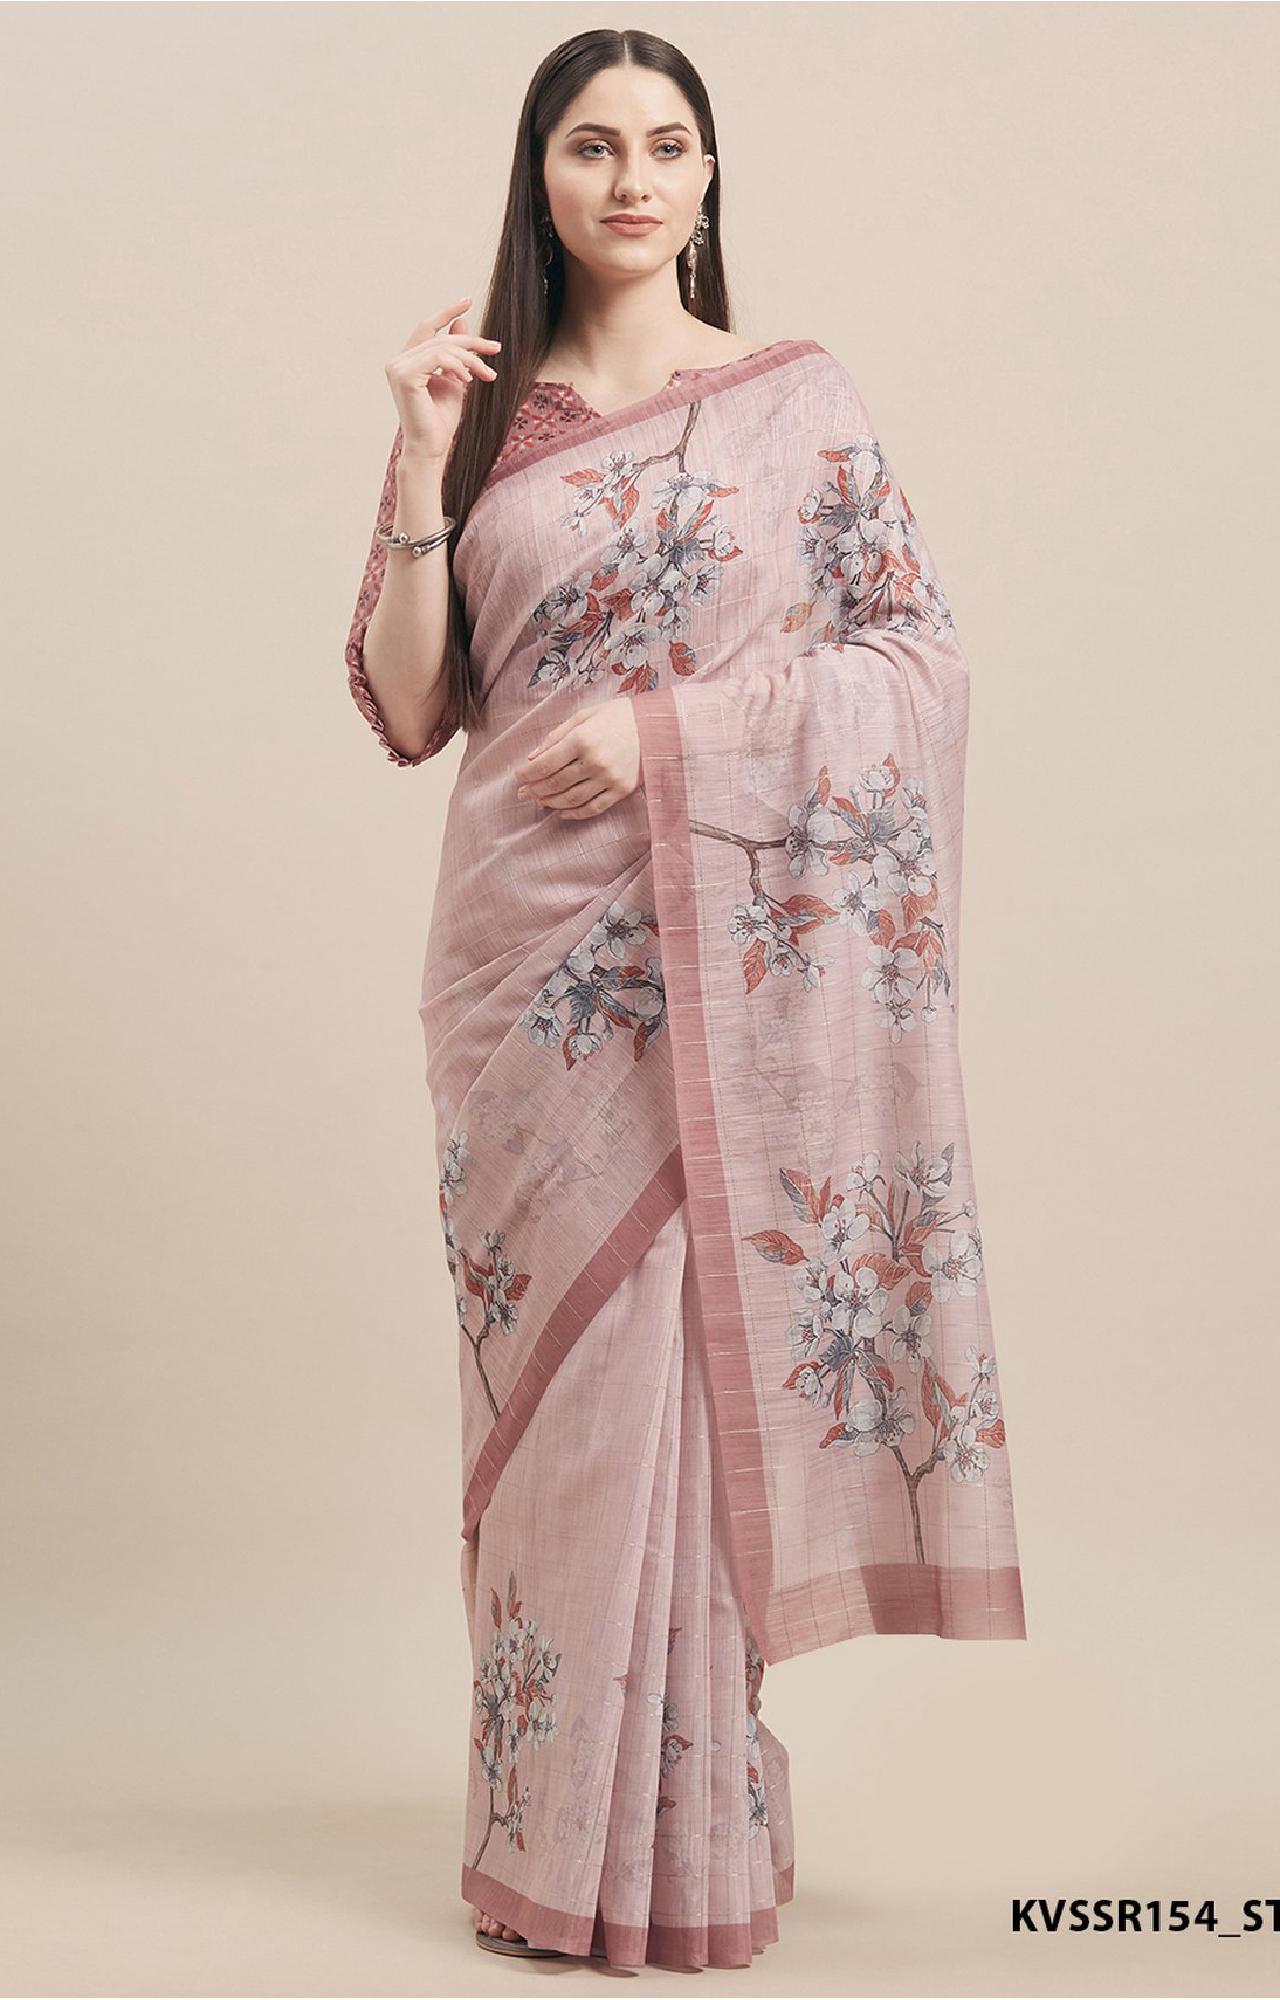 SATIMA | Pink Linen Cotton Floral Print with Weaving Checks